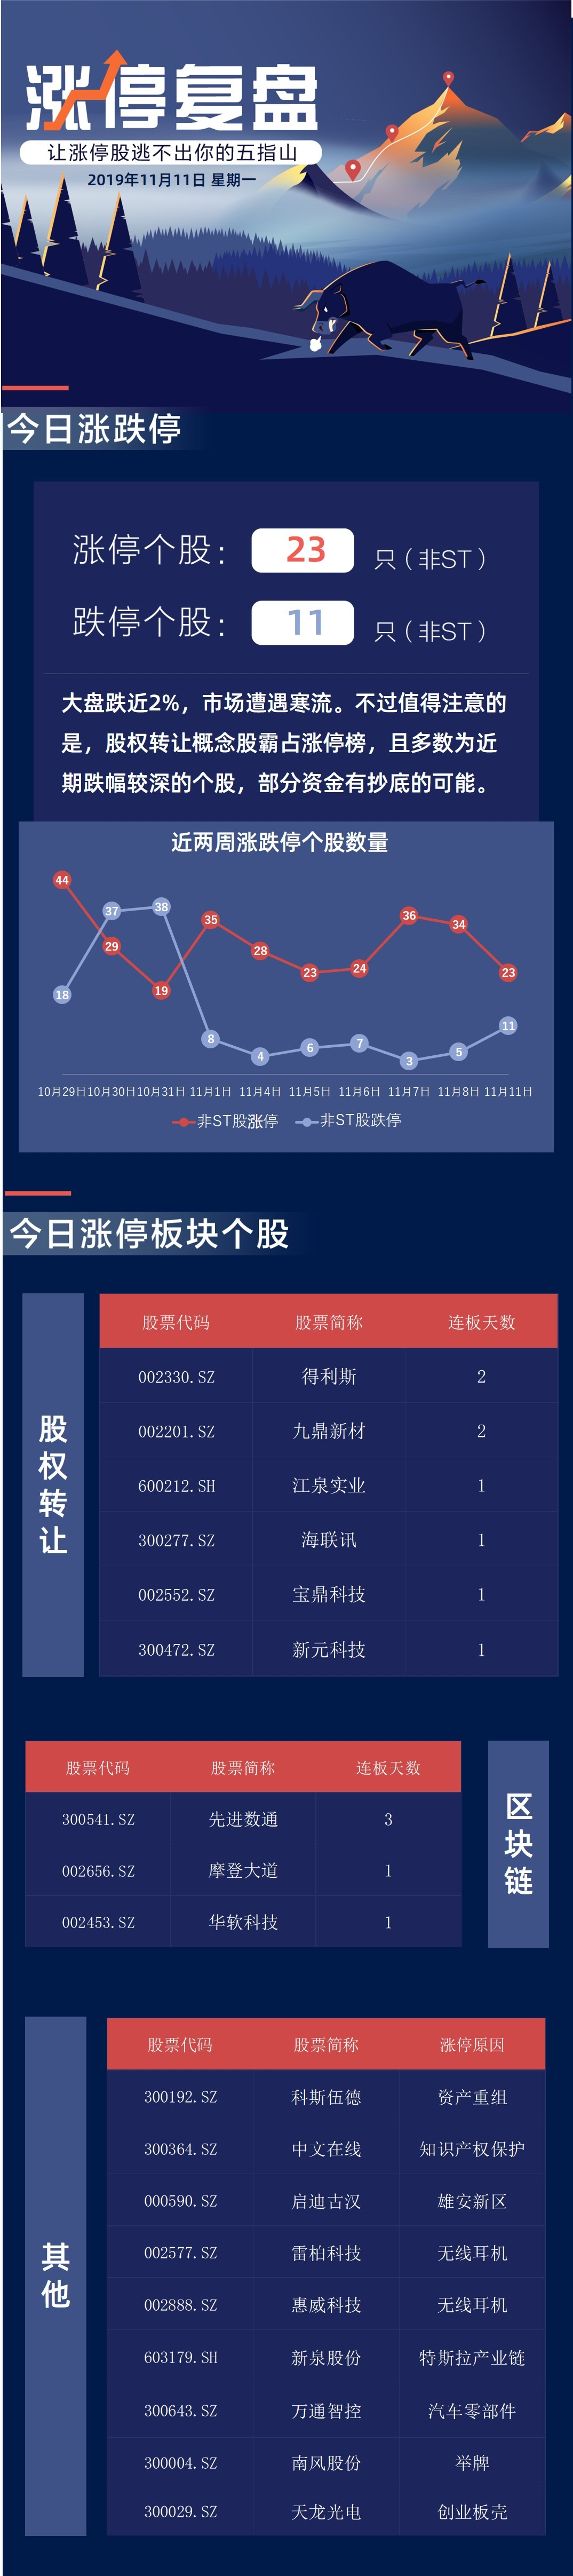 "bbin返水多的网站首页_永州市委党校举行""不忘初心、牢记使命""歌唱比赛"